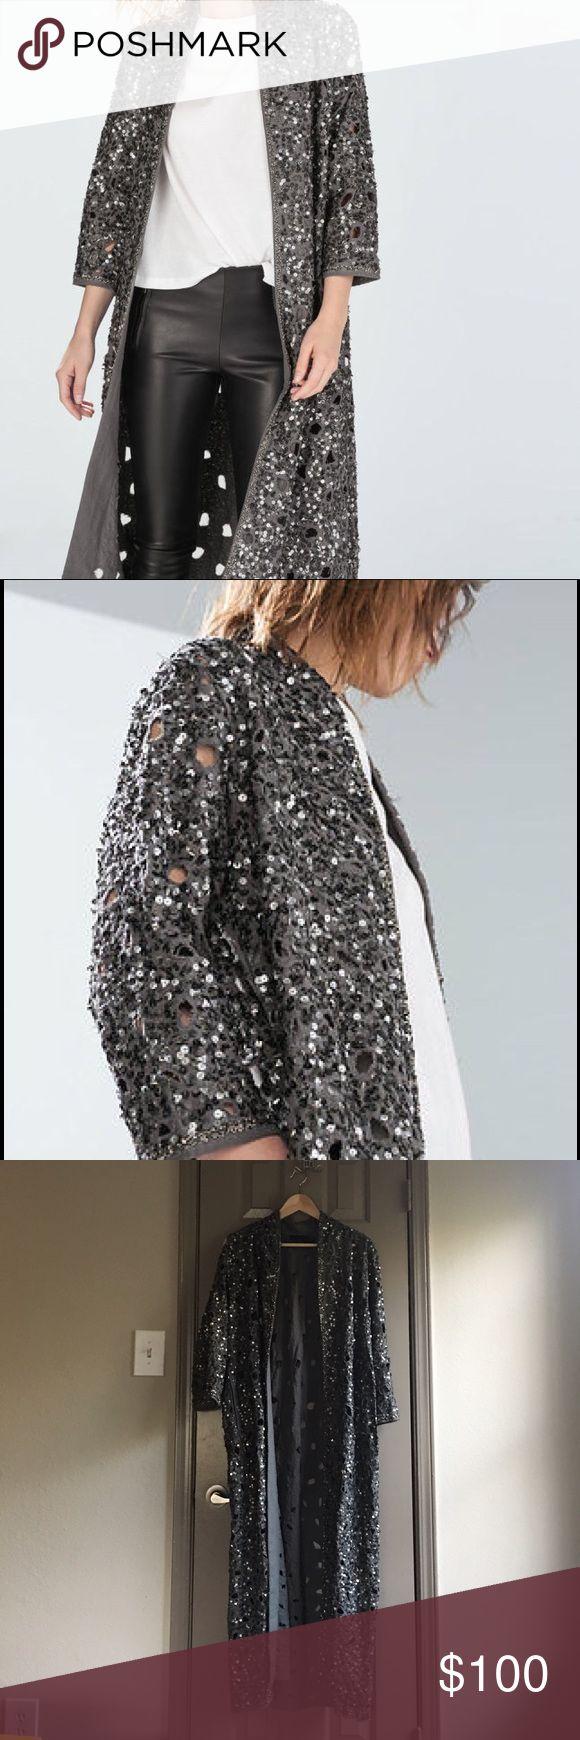 Zara long sequined coat never worn Perfect for this holiday season Zara Jackets & Coats